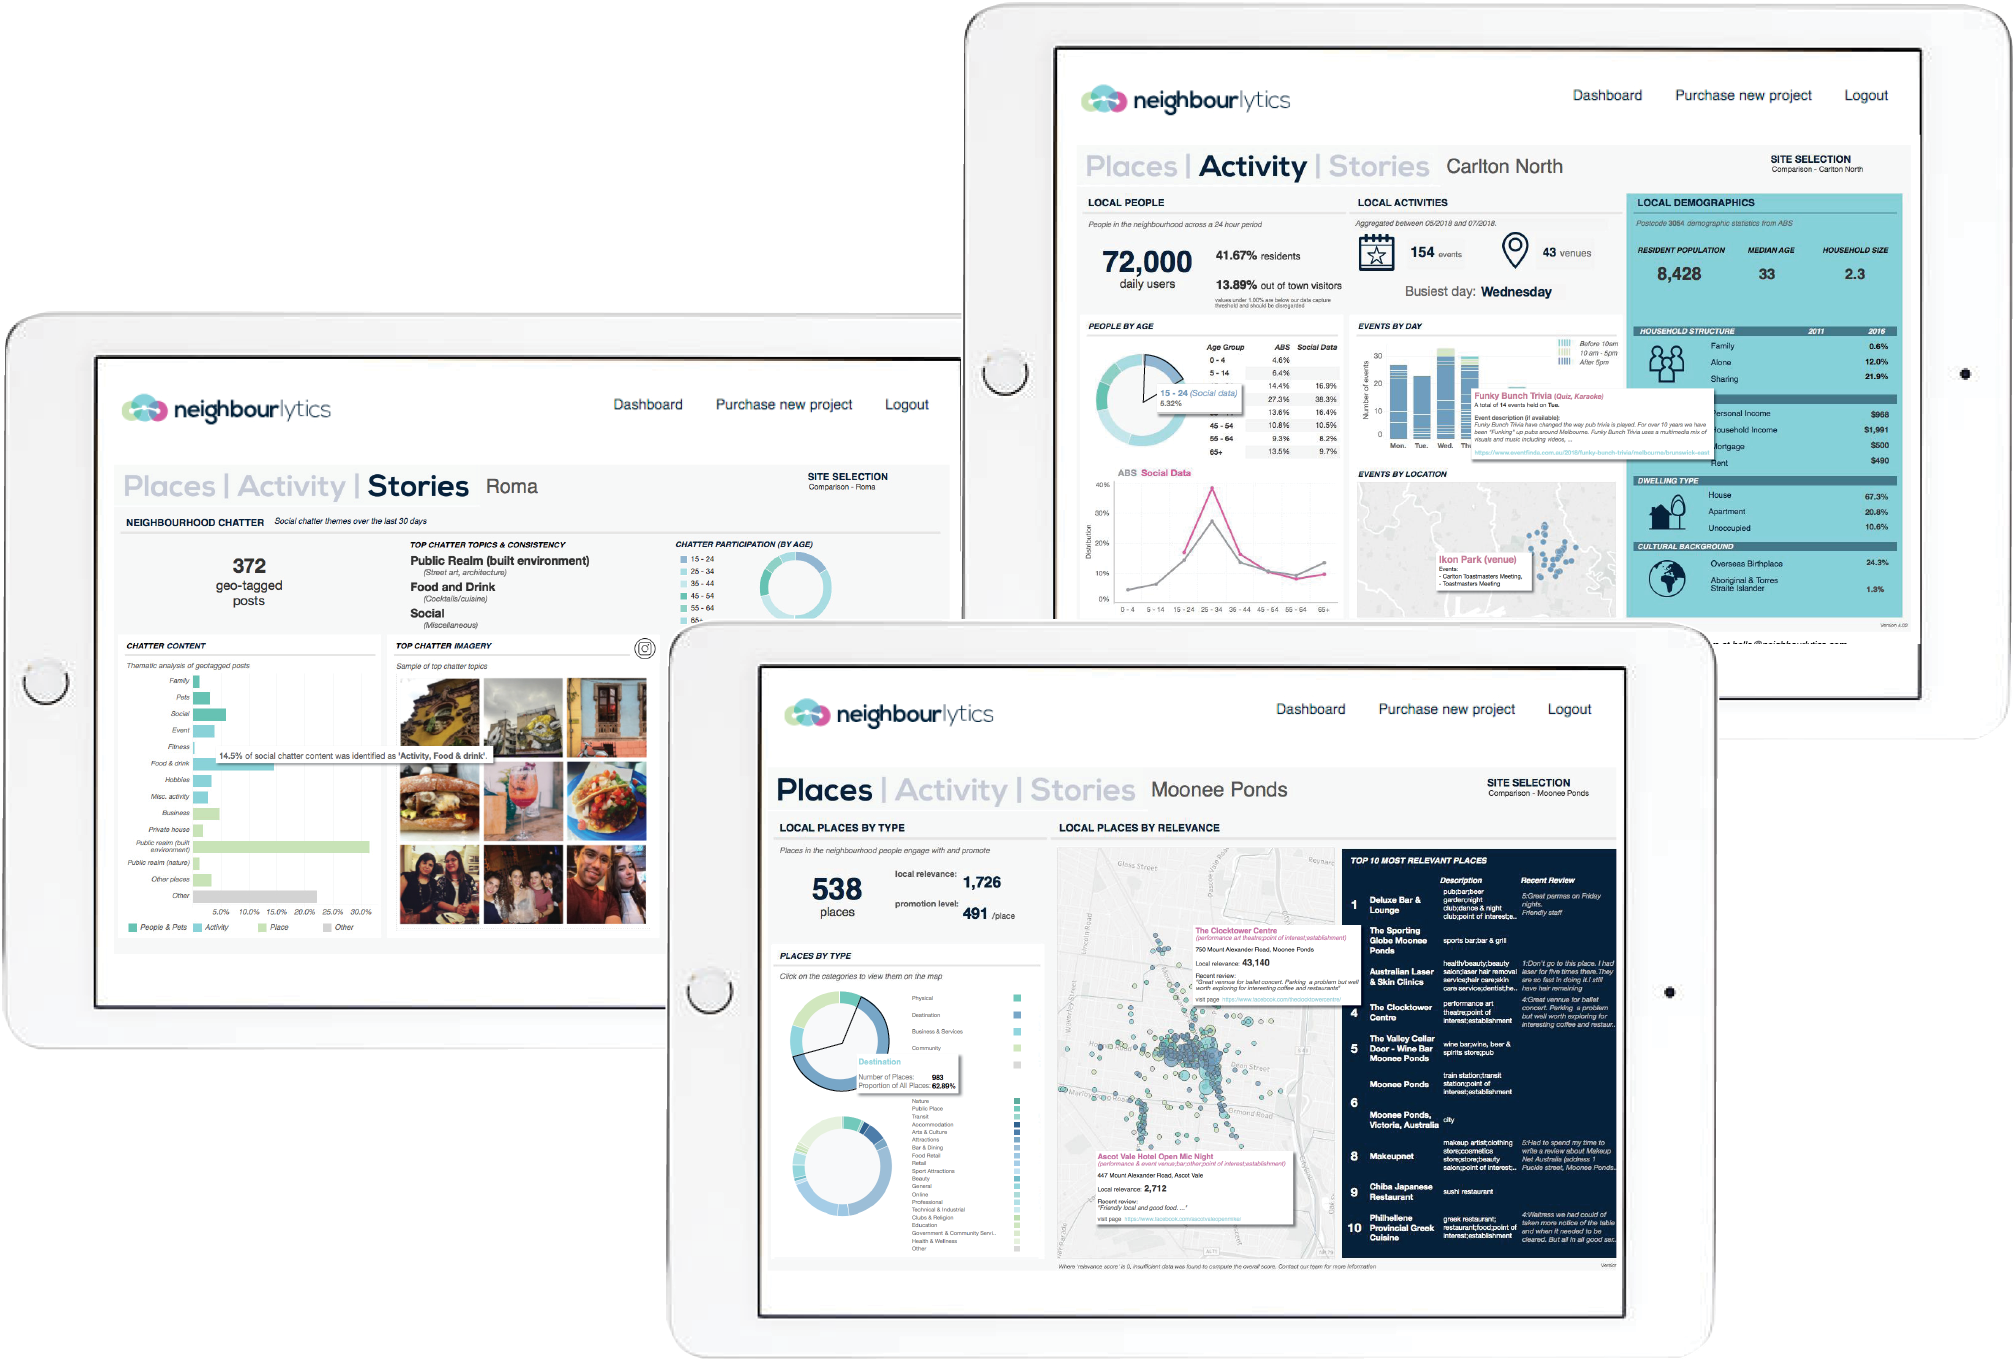 iPads showing images of Neighbourlytics